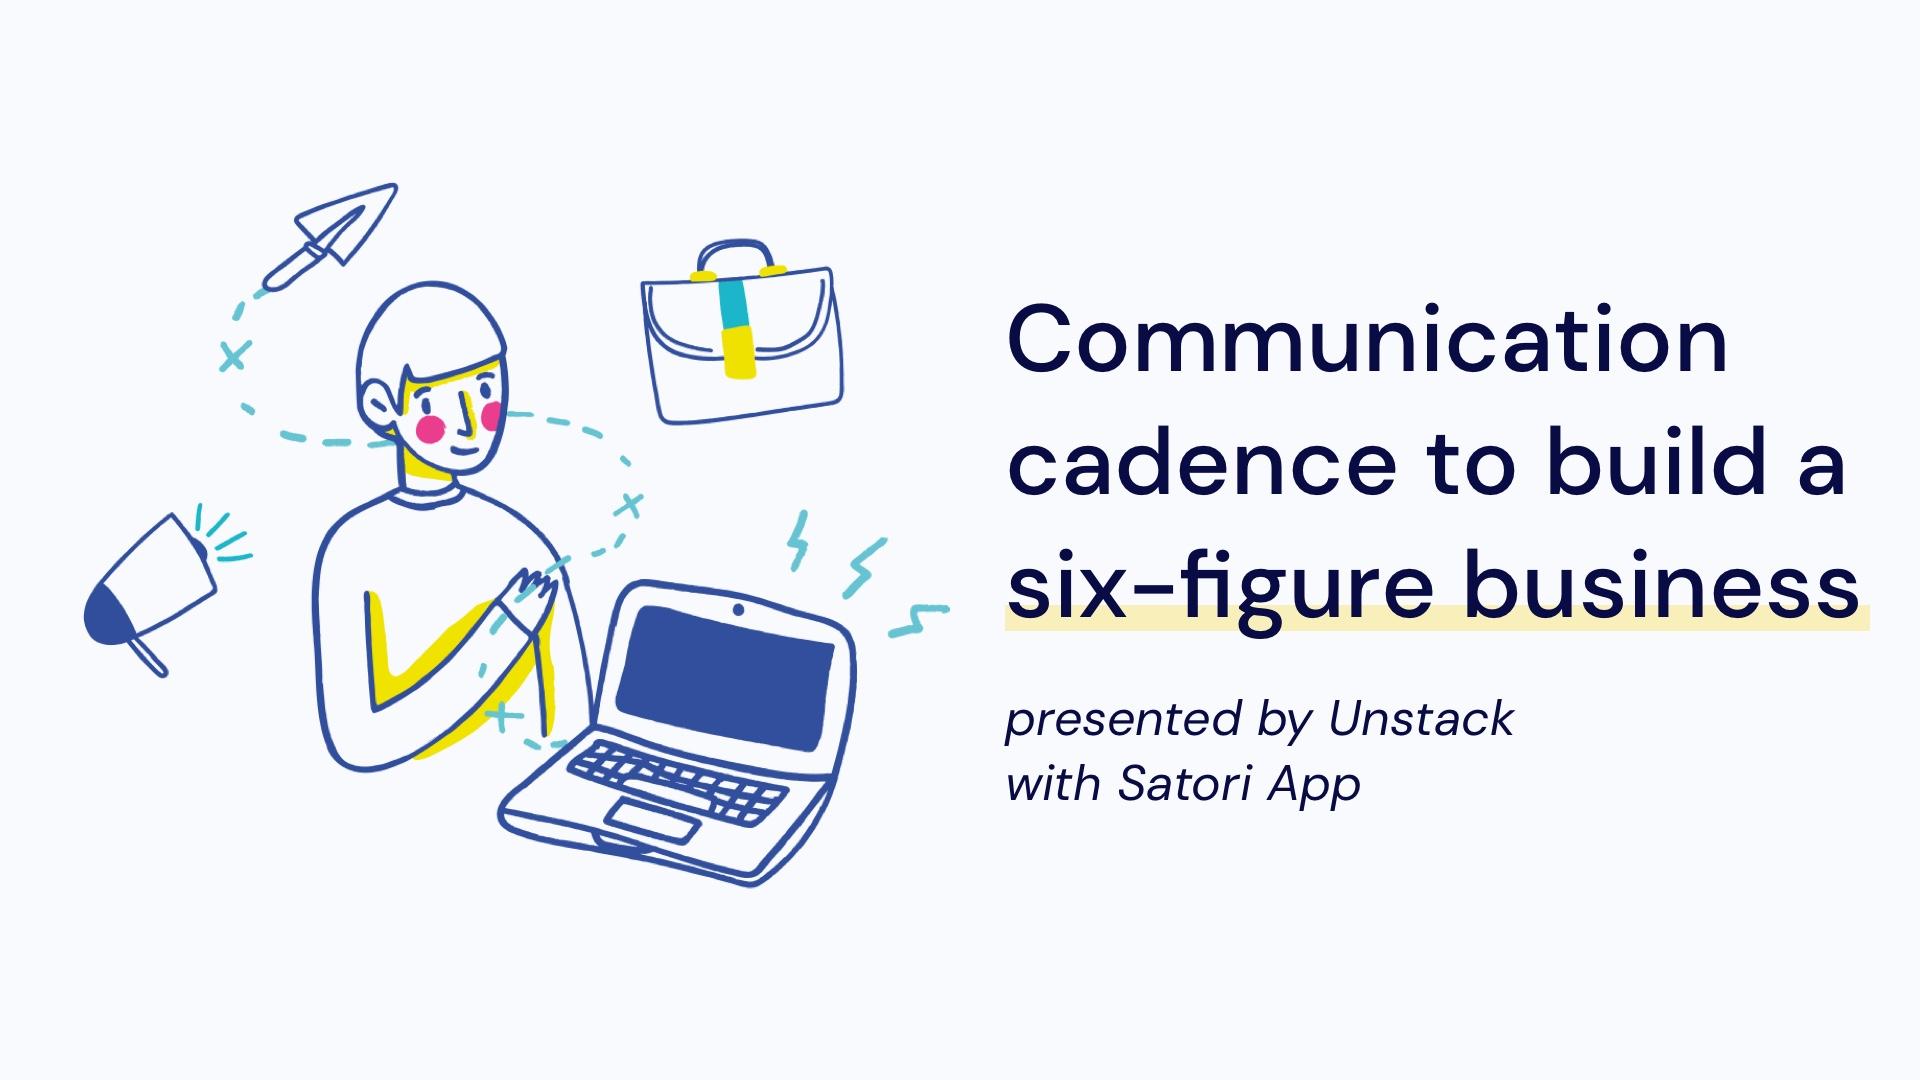 Communication cadence to build a six-figure business